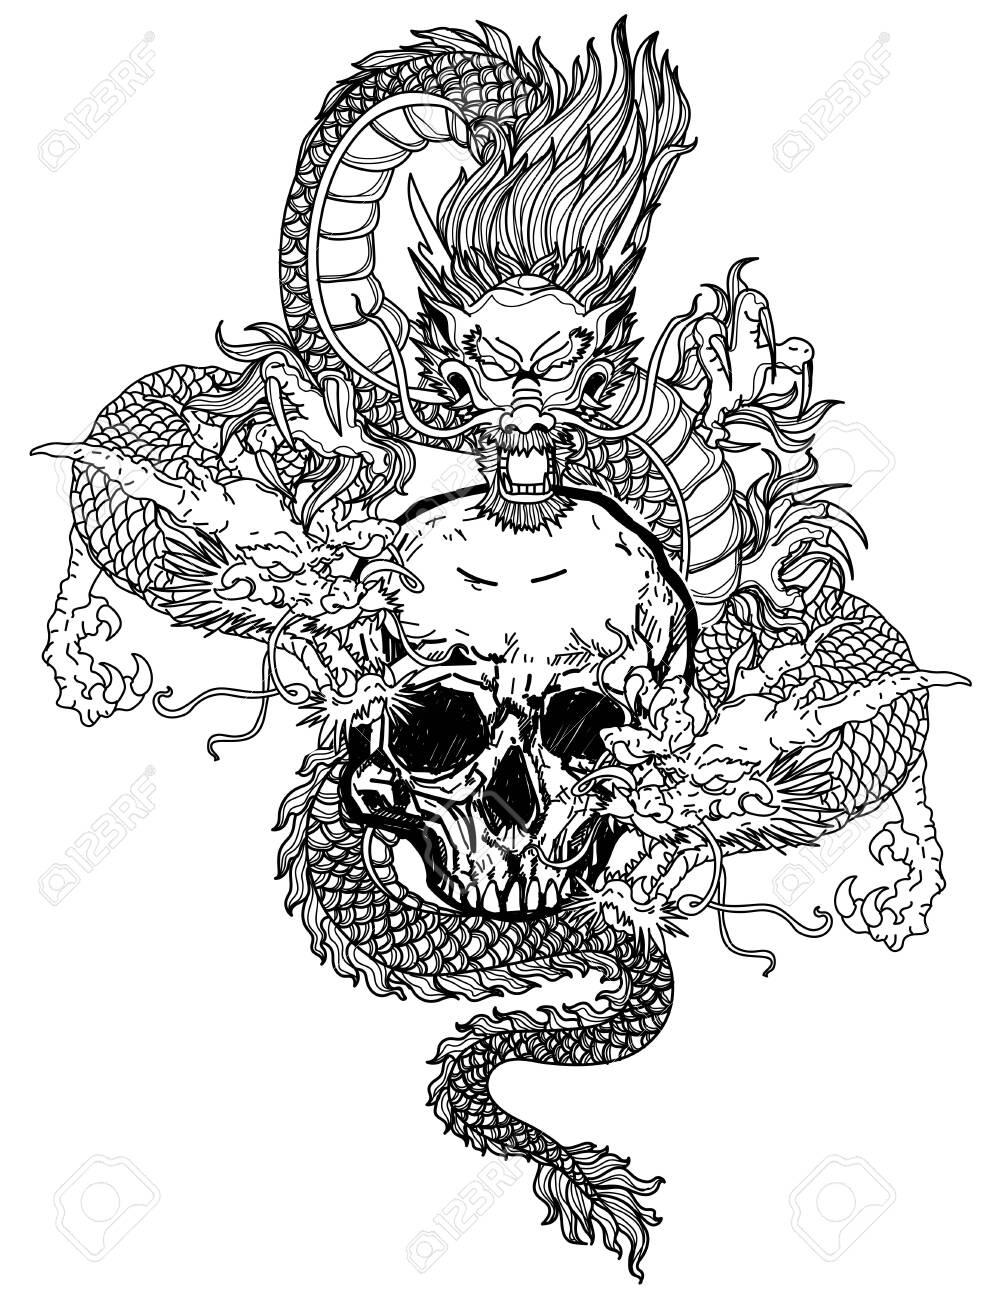 Tattoo art dargon hand drawing black and white - 137748632